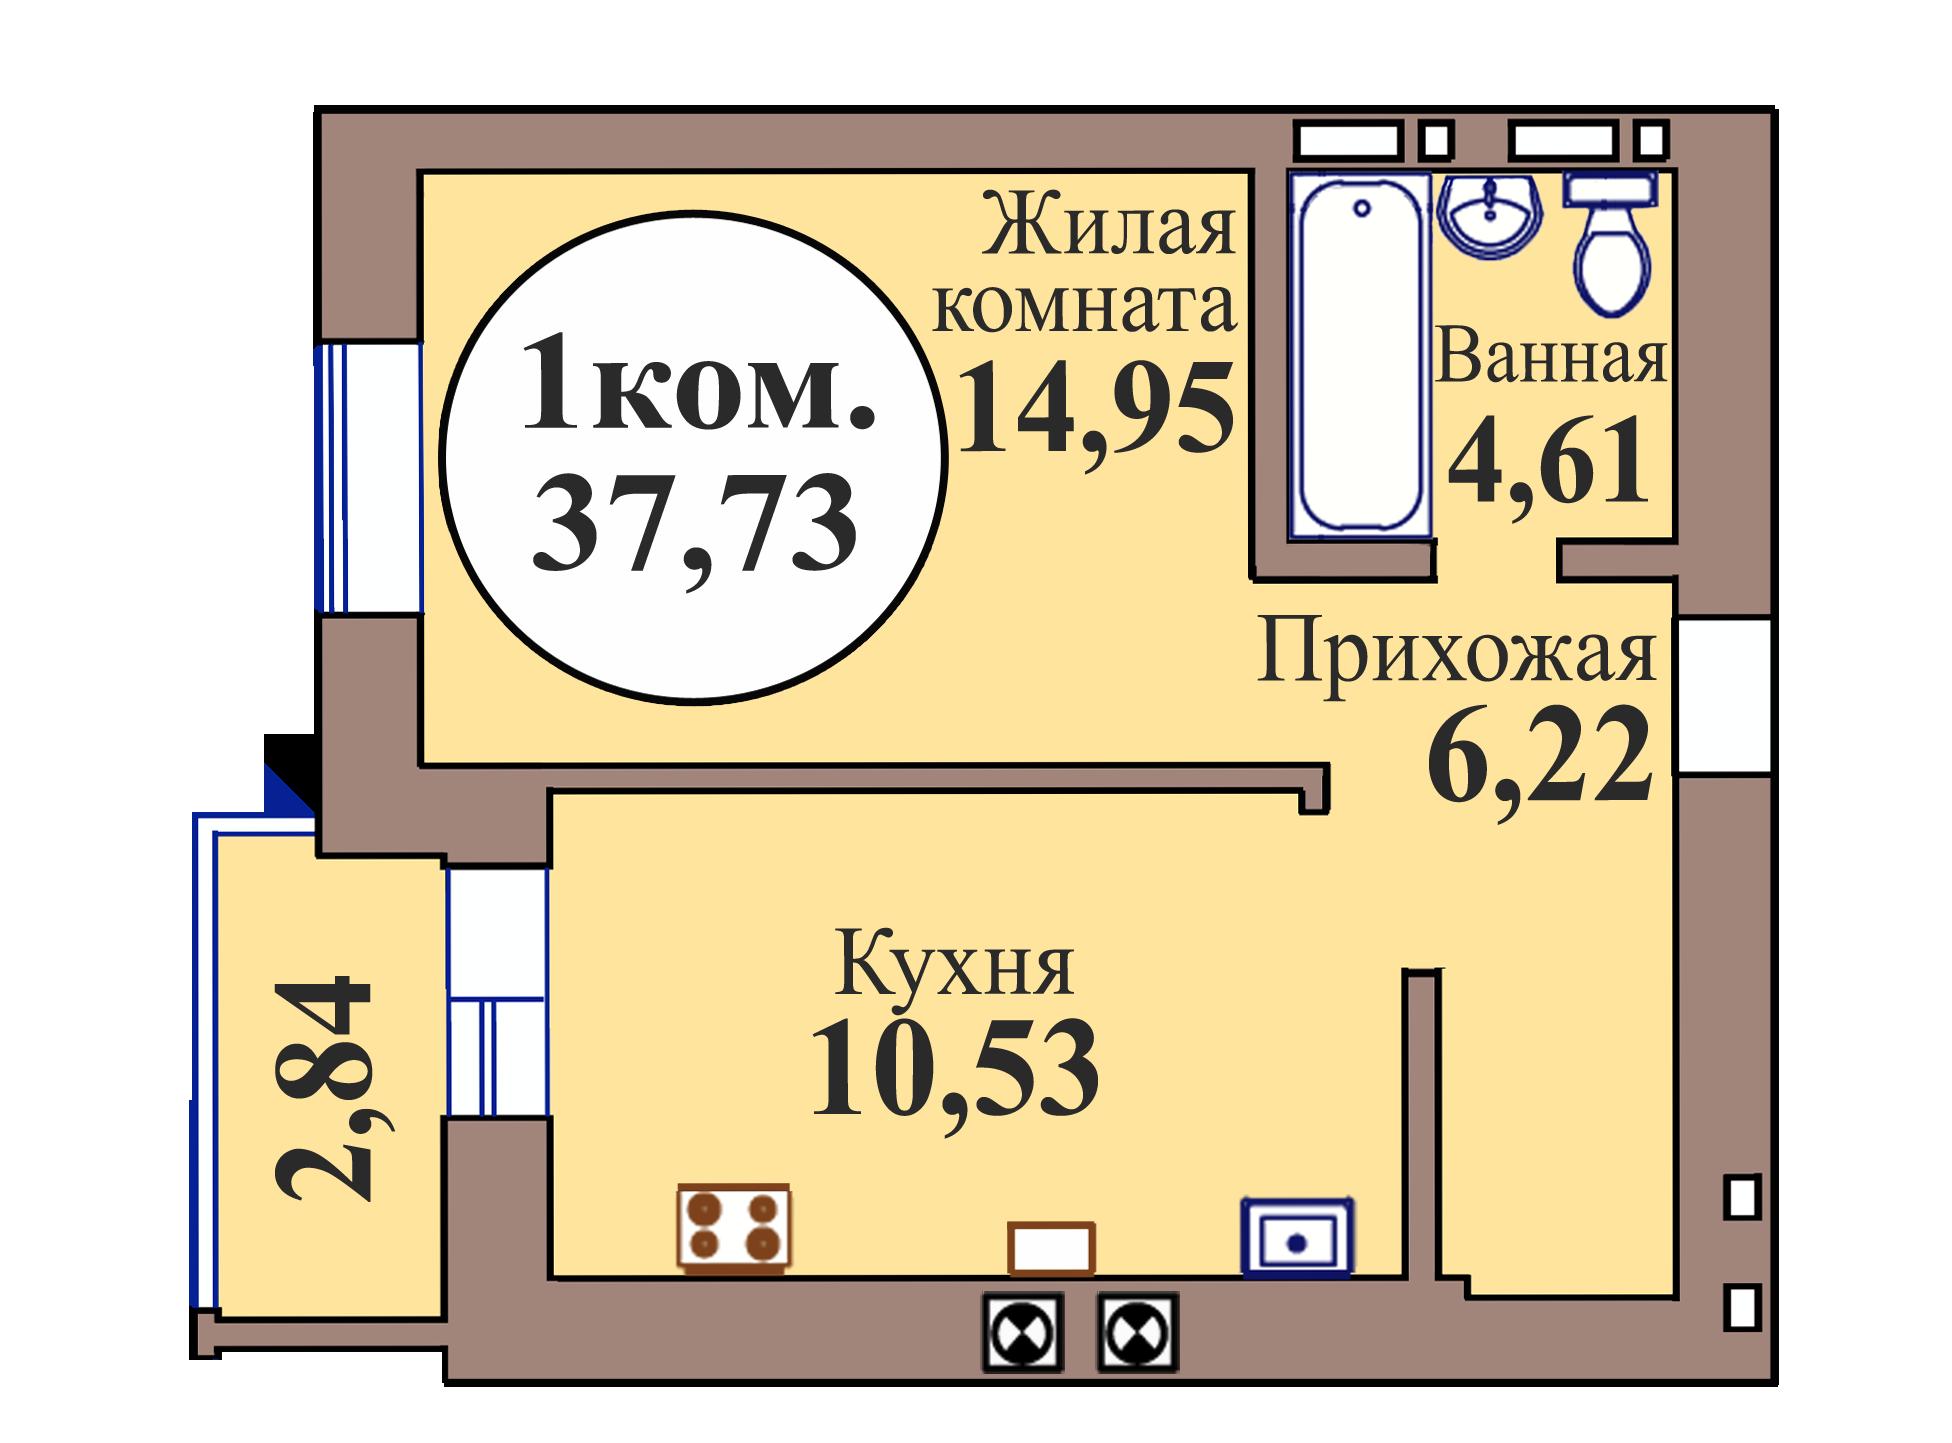 1-комн. кв. по пер. Калининградский, 5 кв. 214 в Калининграде